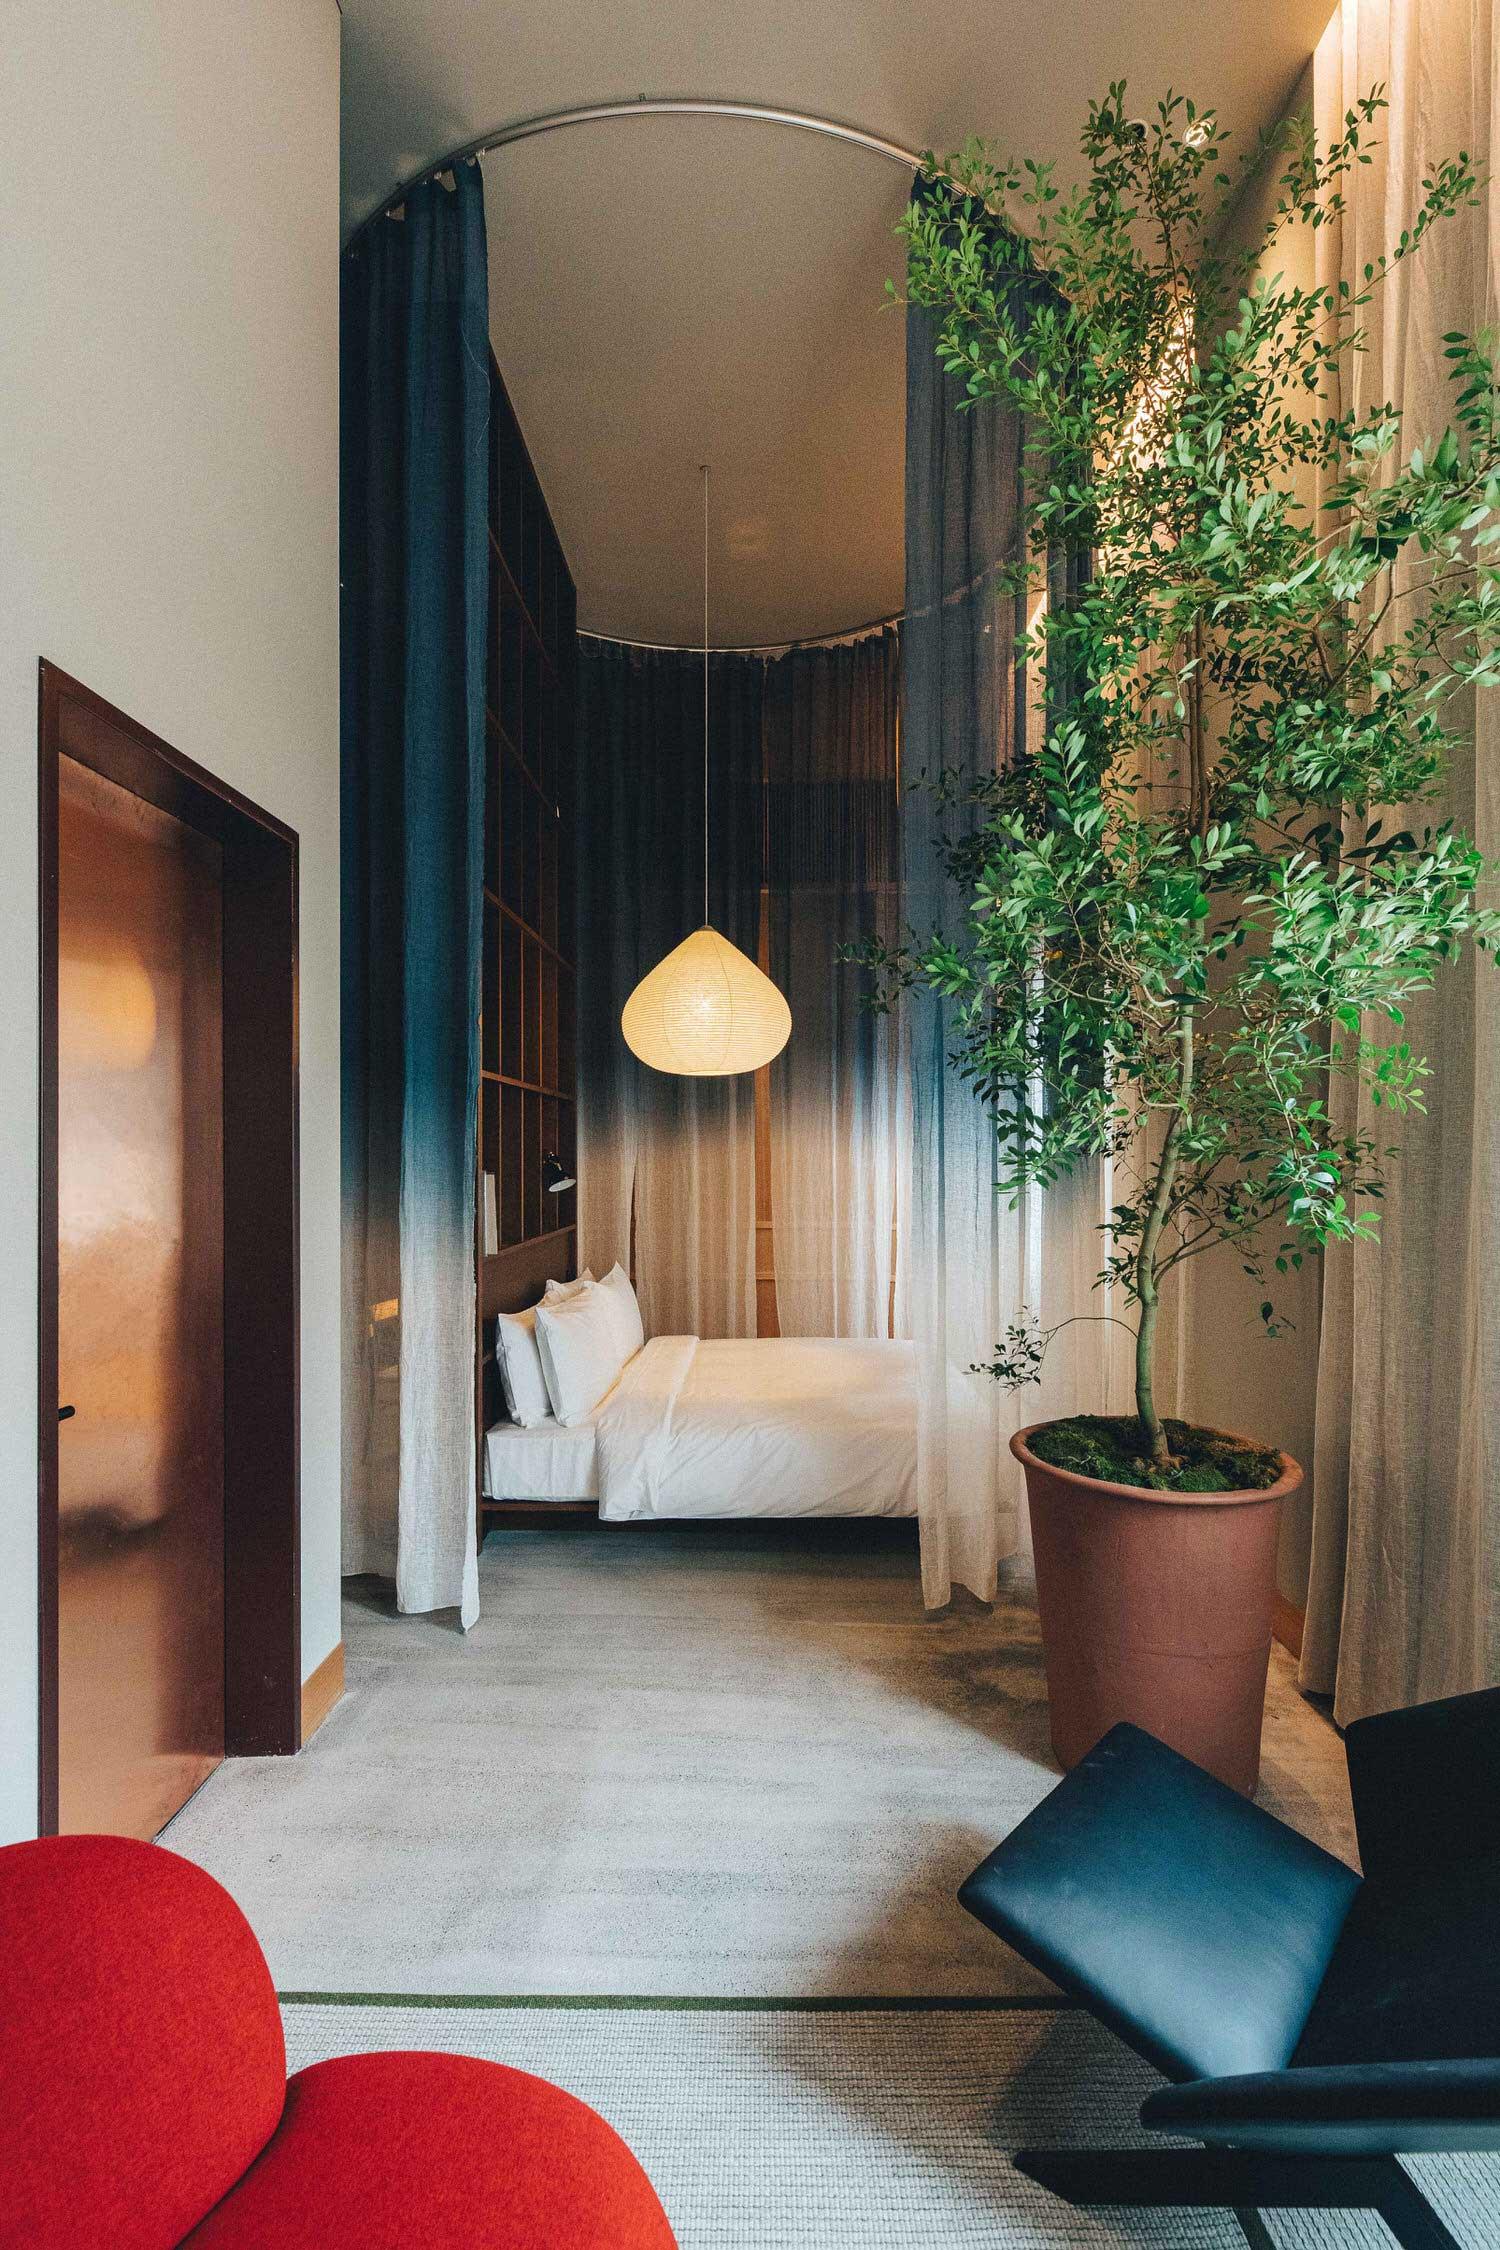 K5 Tokyo, Claesson Koivisto Rune, Hotel Design, Photo Yikin Hyo | Yellowtrace